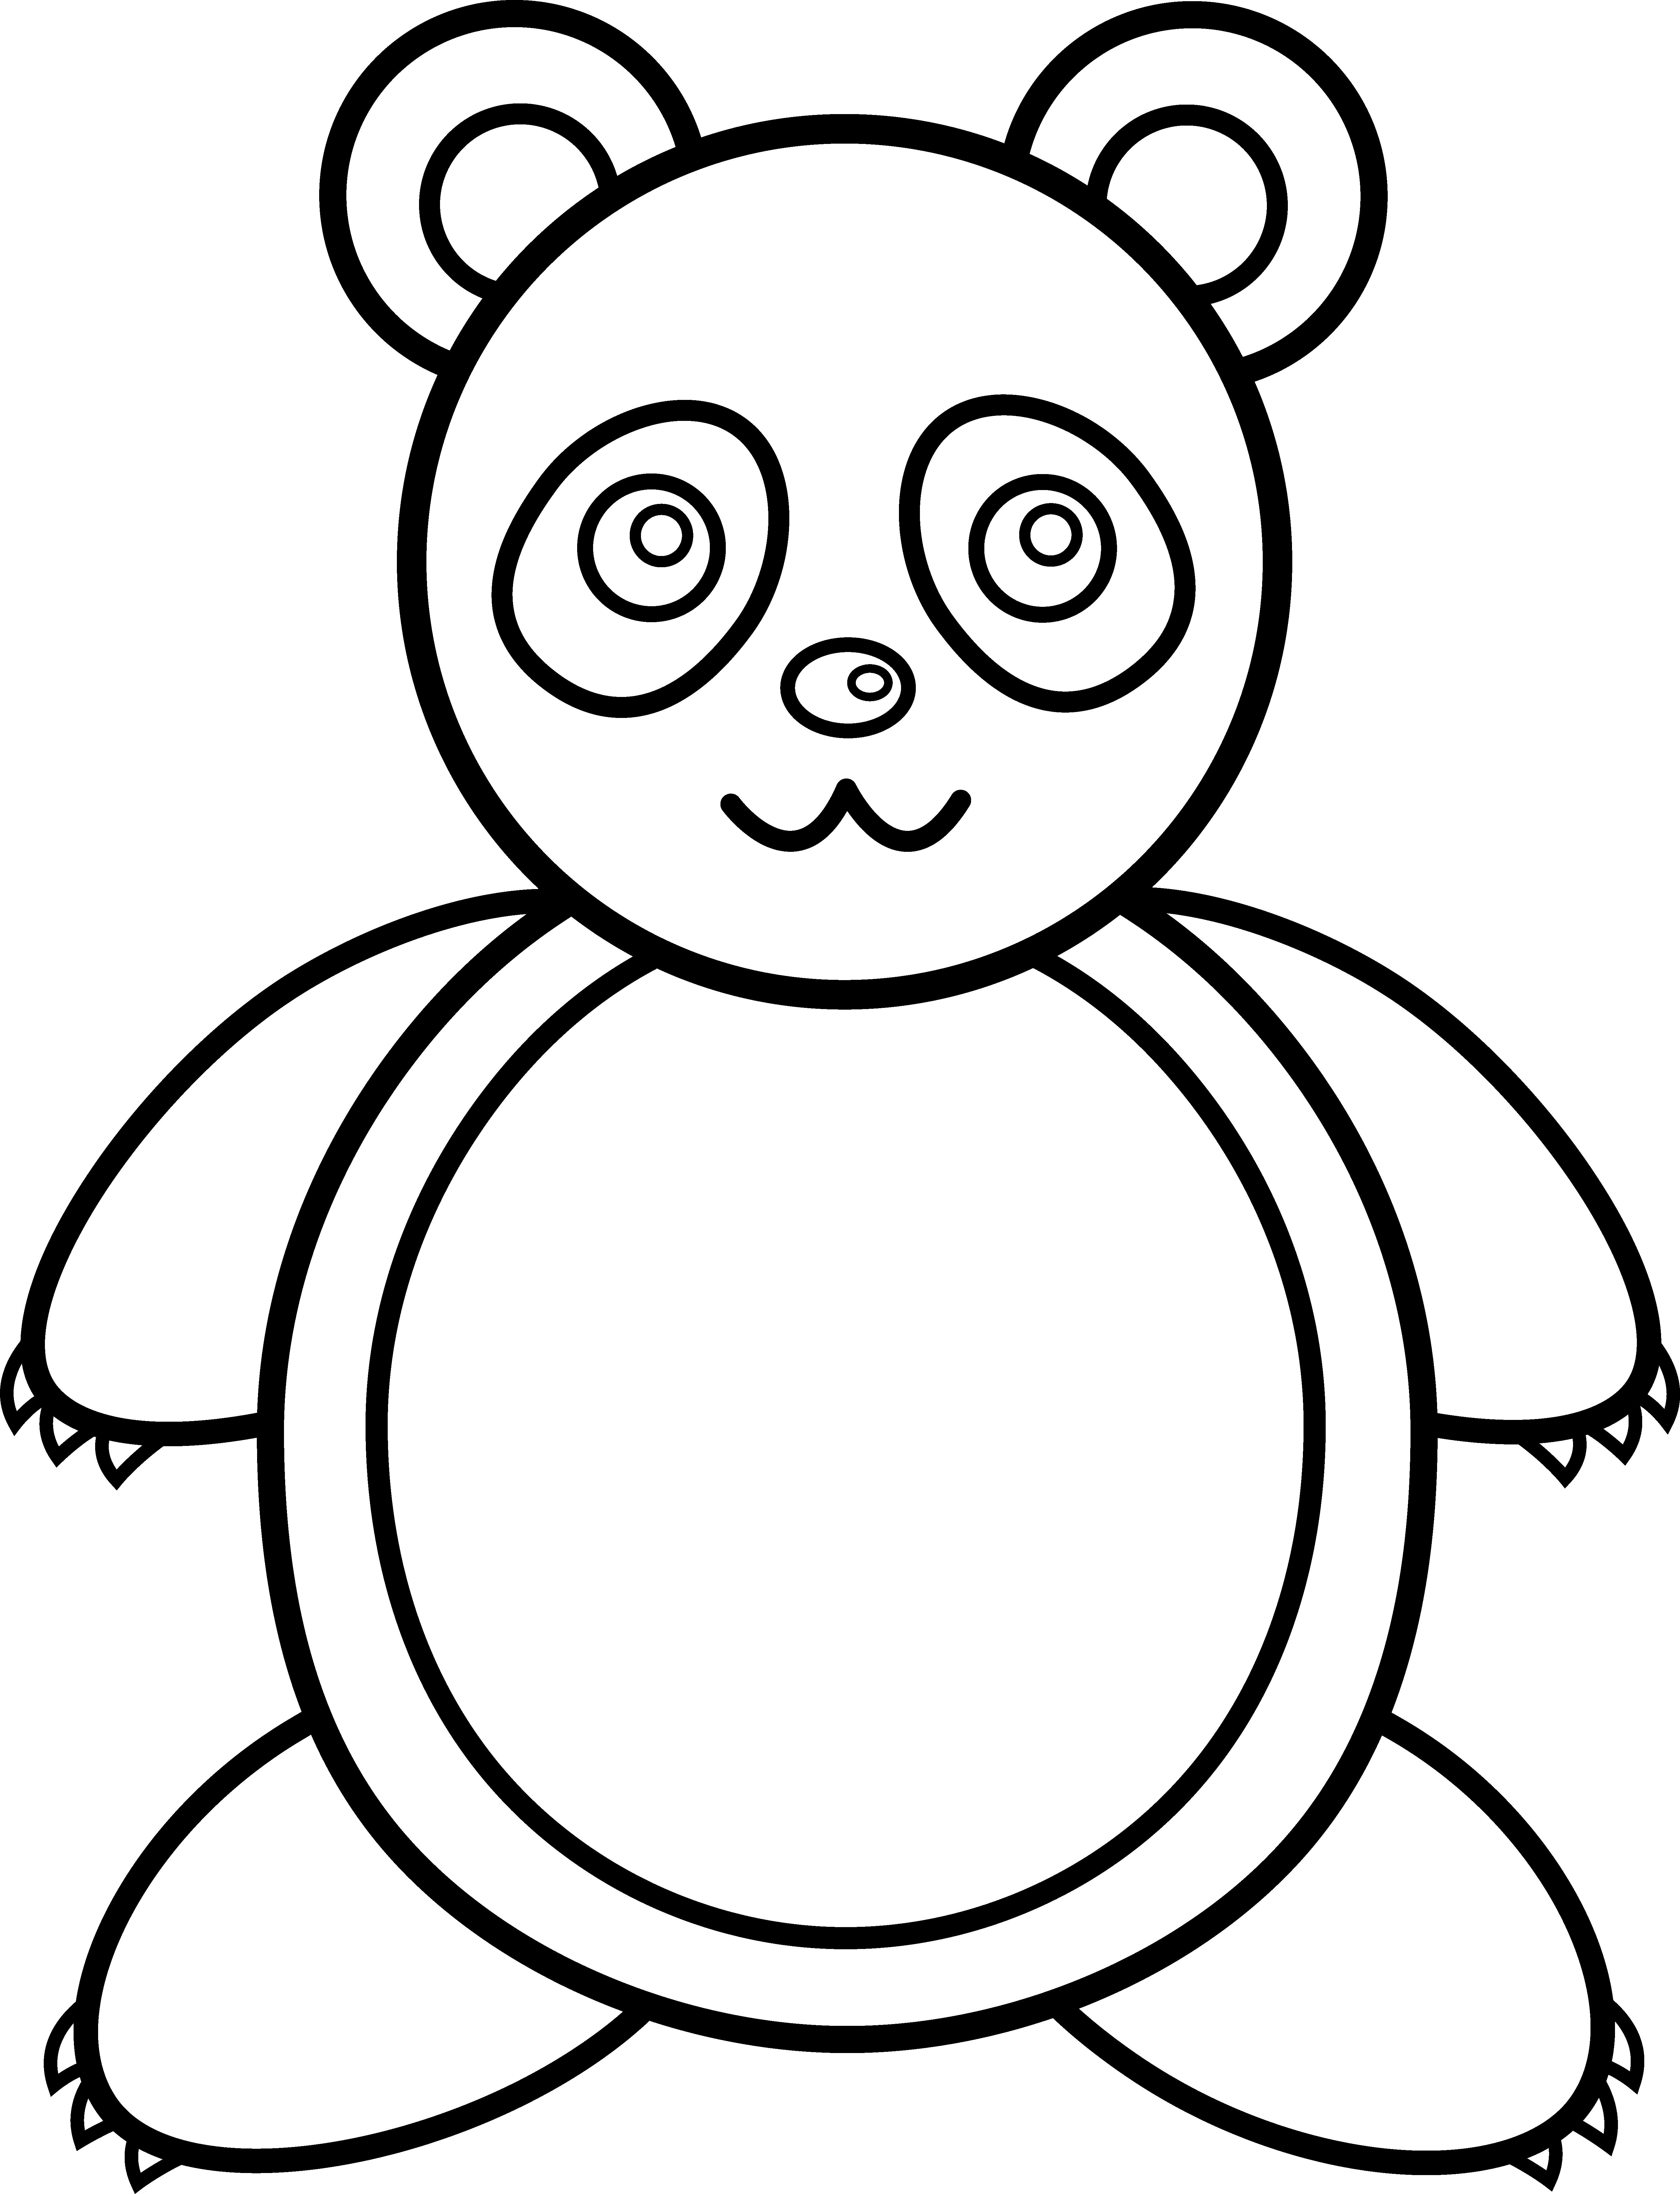 image library stock Bear outline clipart. Panda line art free